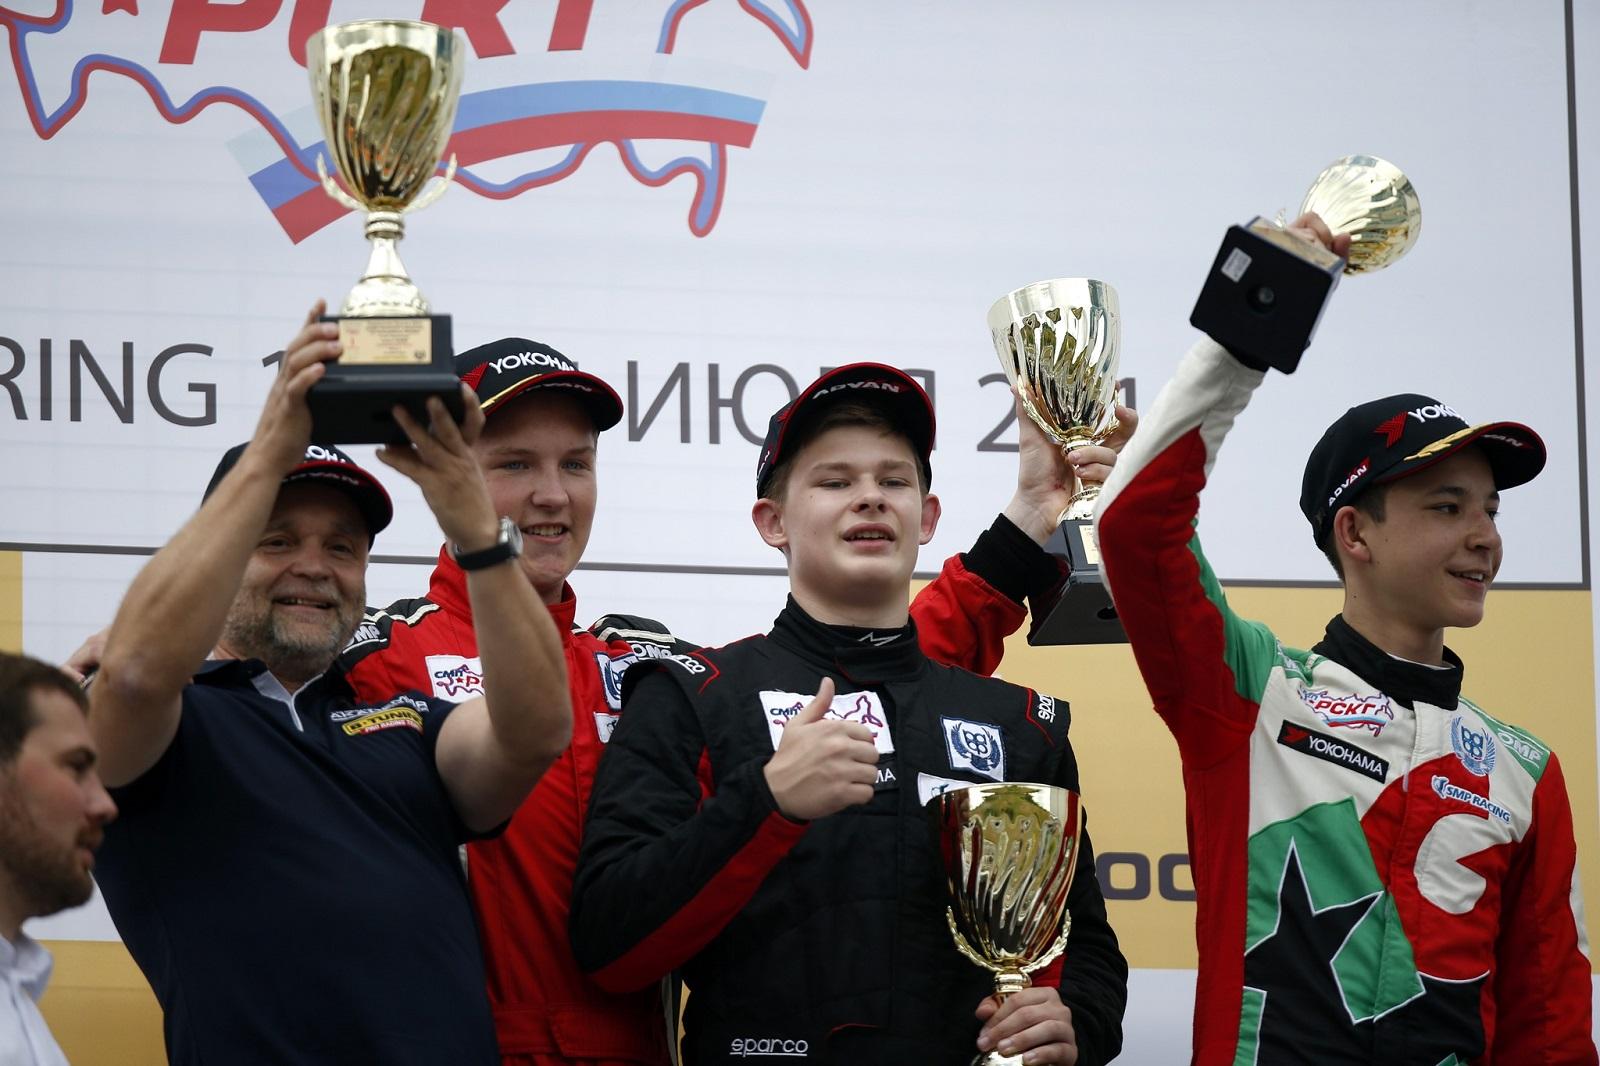 B-Tuning: победа в гонках в Мячково